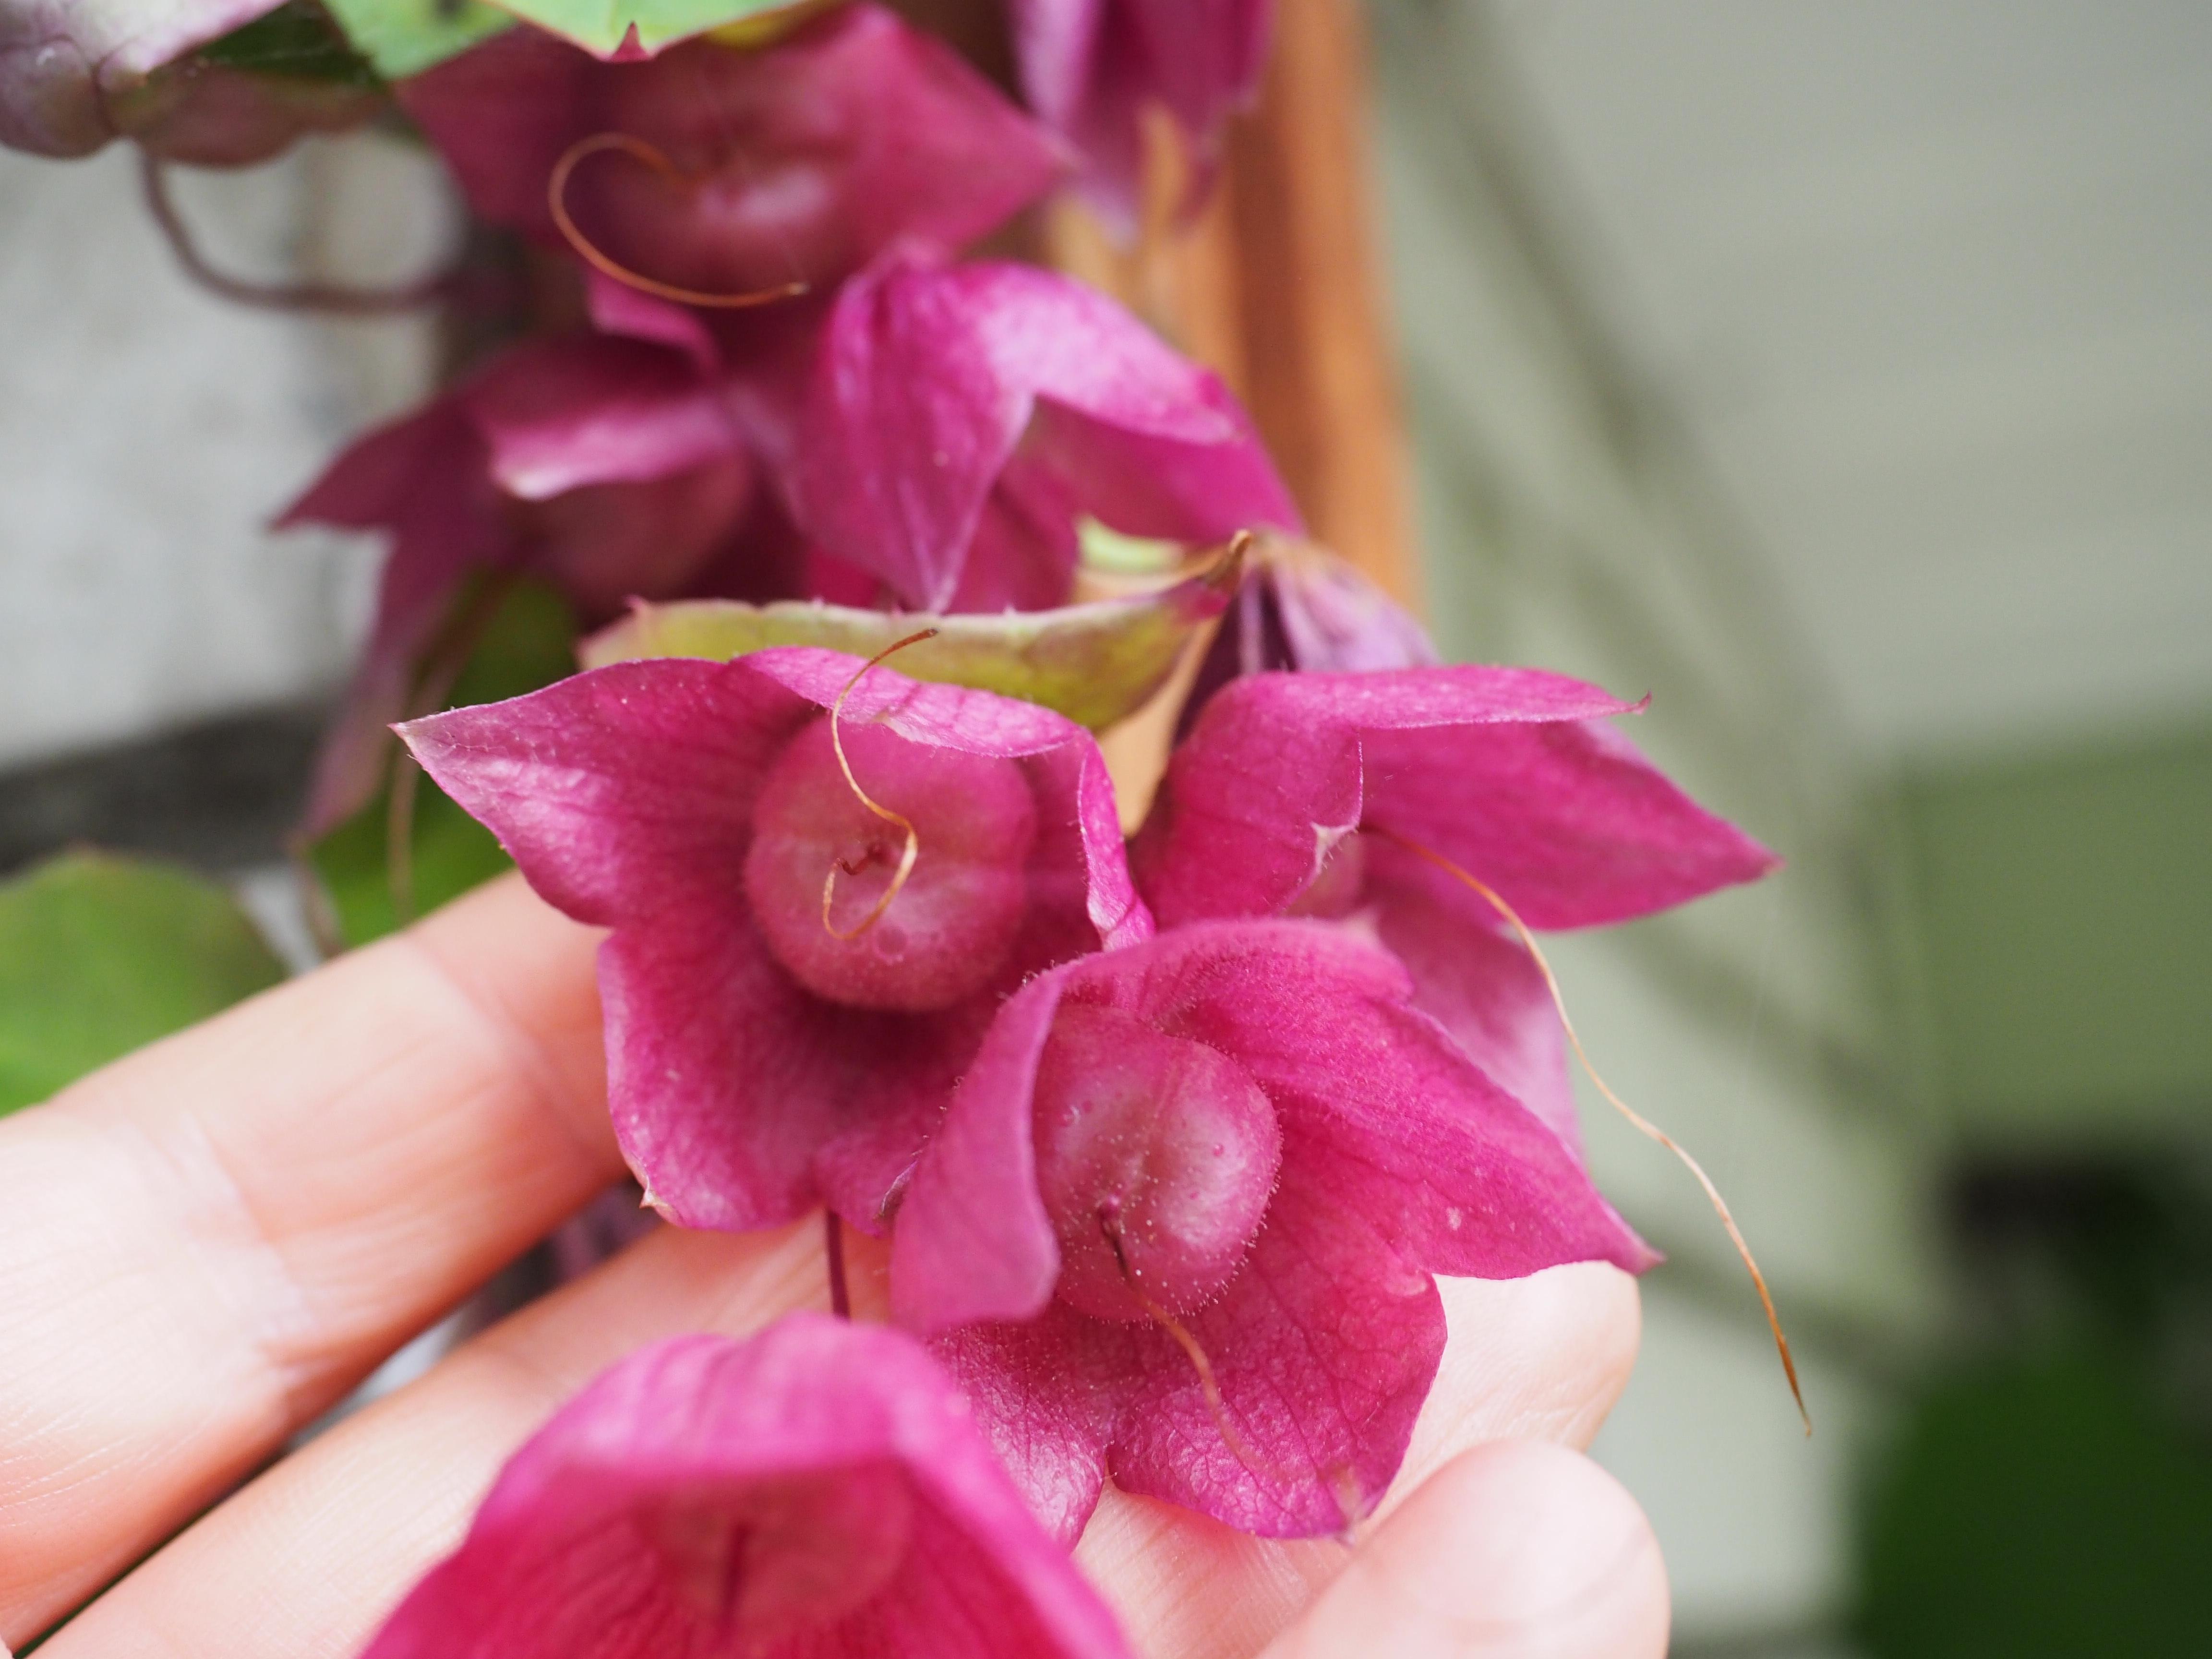 Blodbeger frø er snart modne og klar til neste års planter